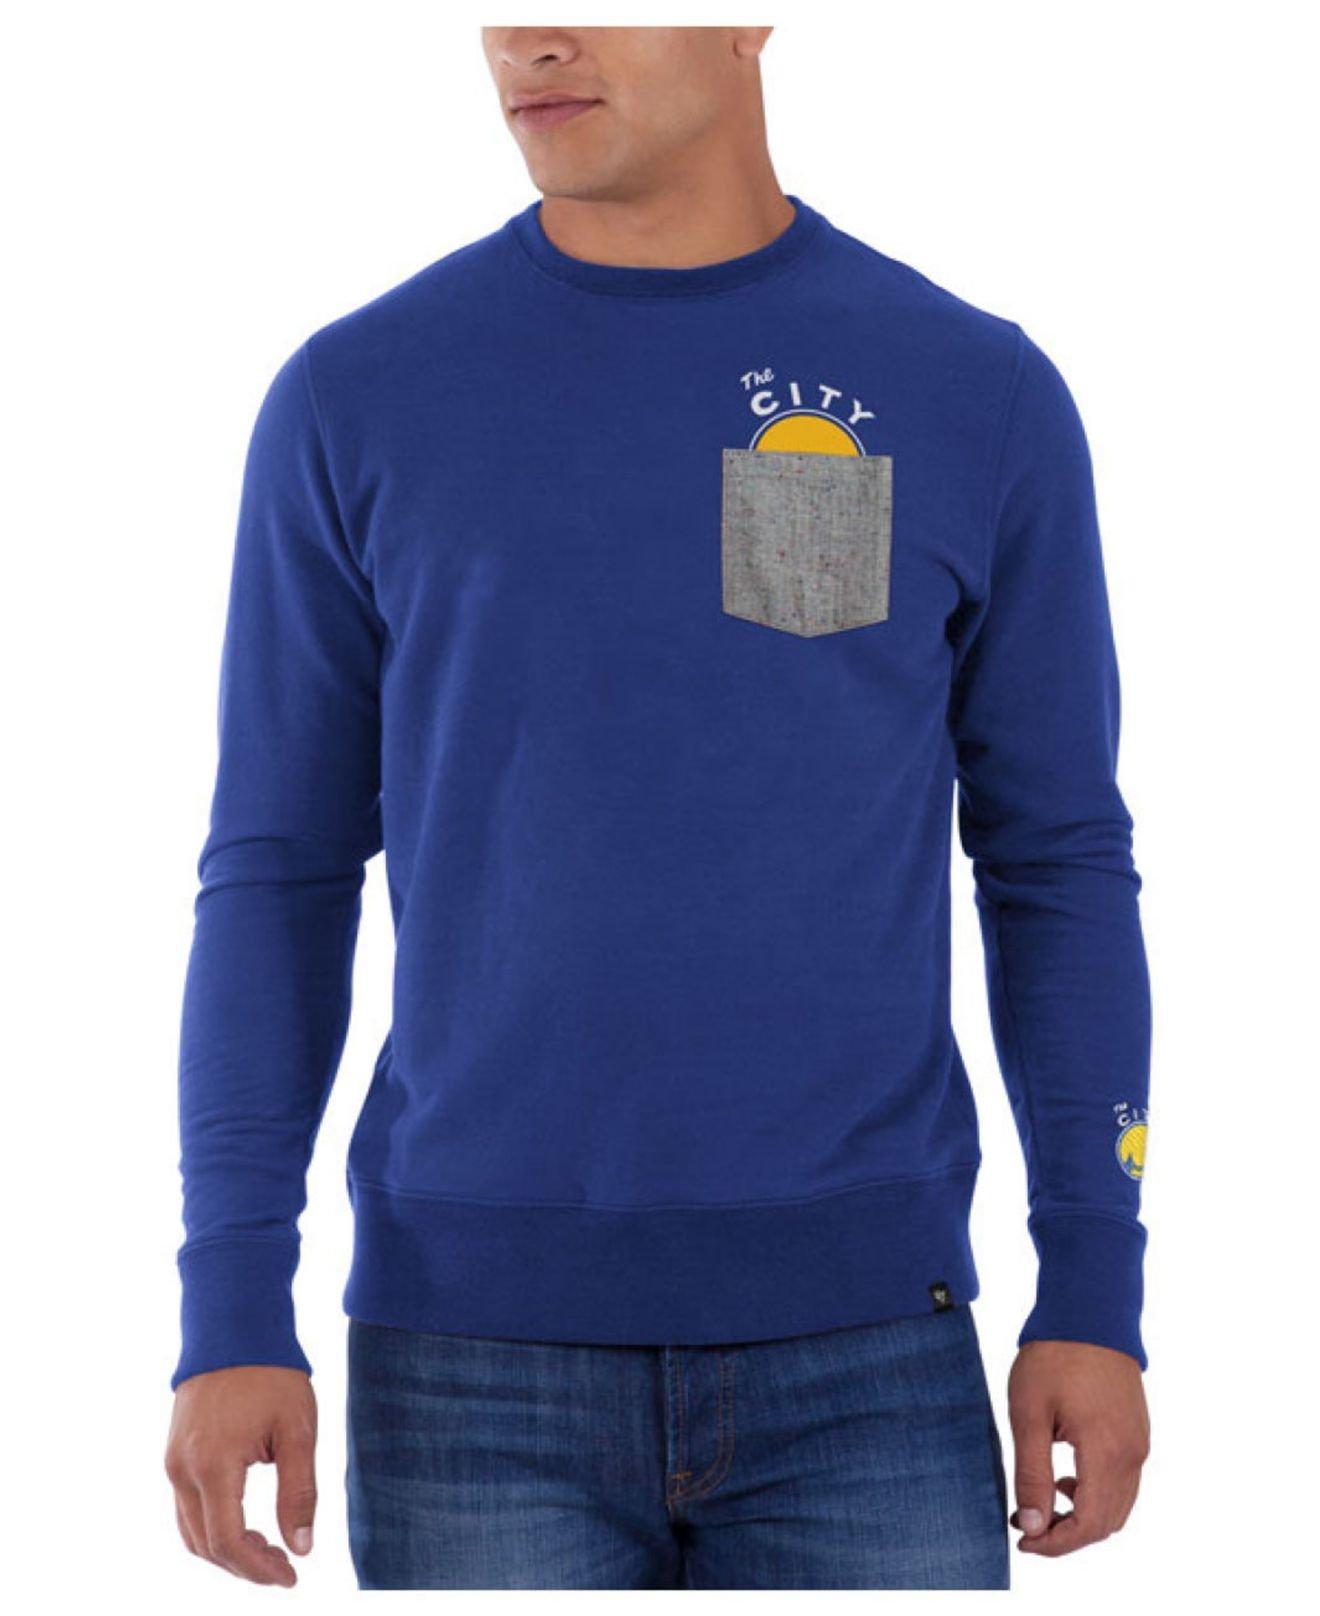 474a0fd9 Adidas Golden State Warriors Practice Performance Long Sleeve T Shirt